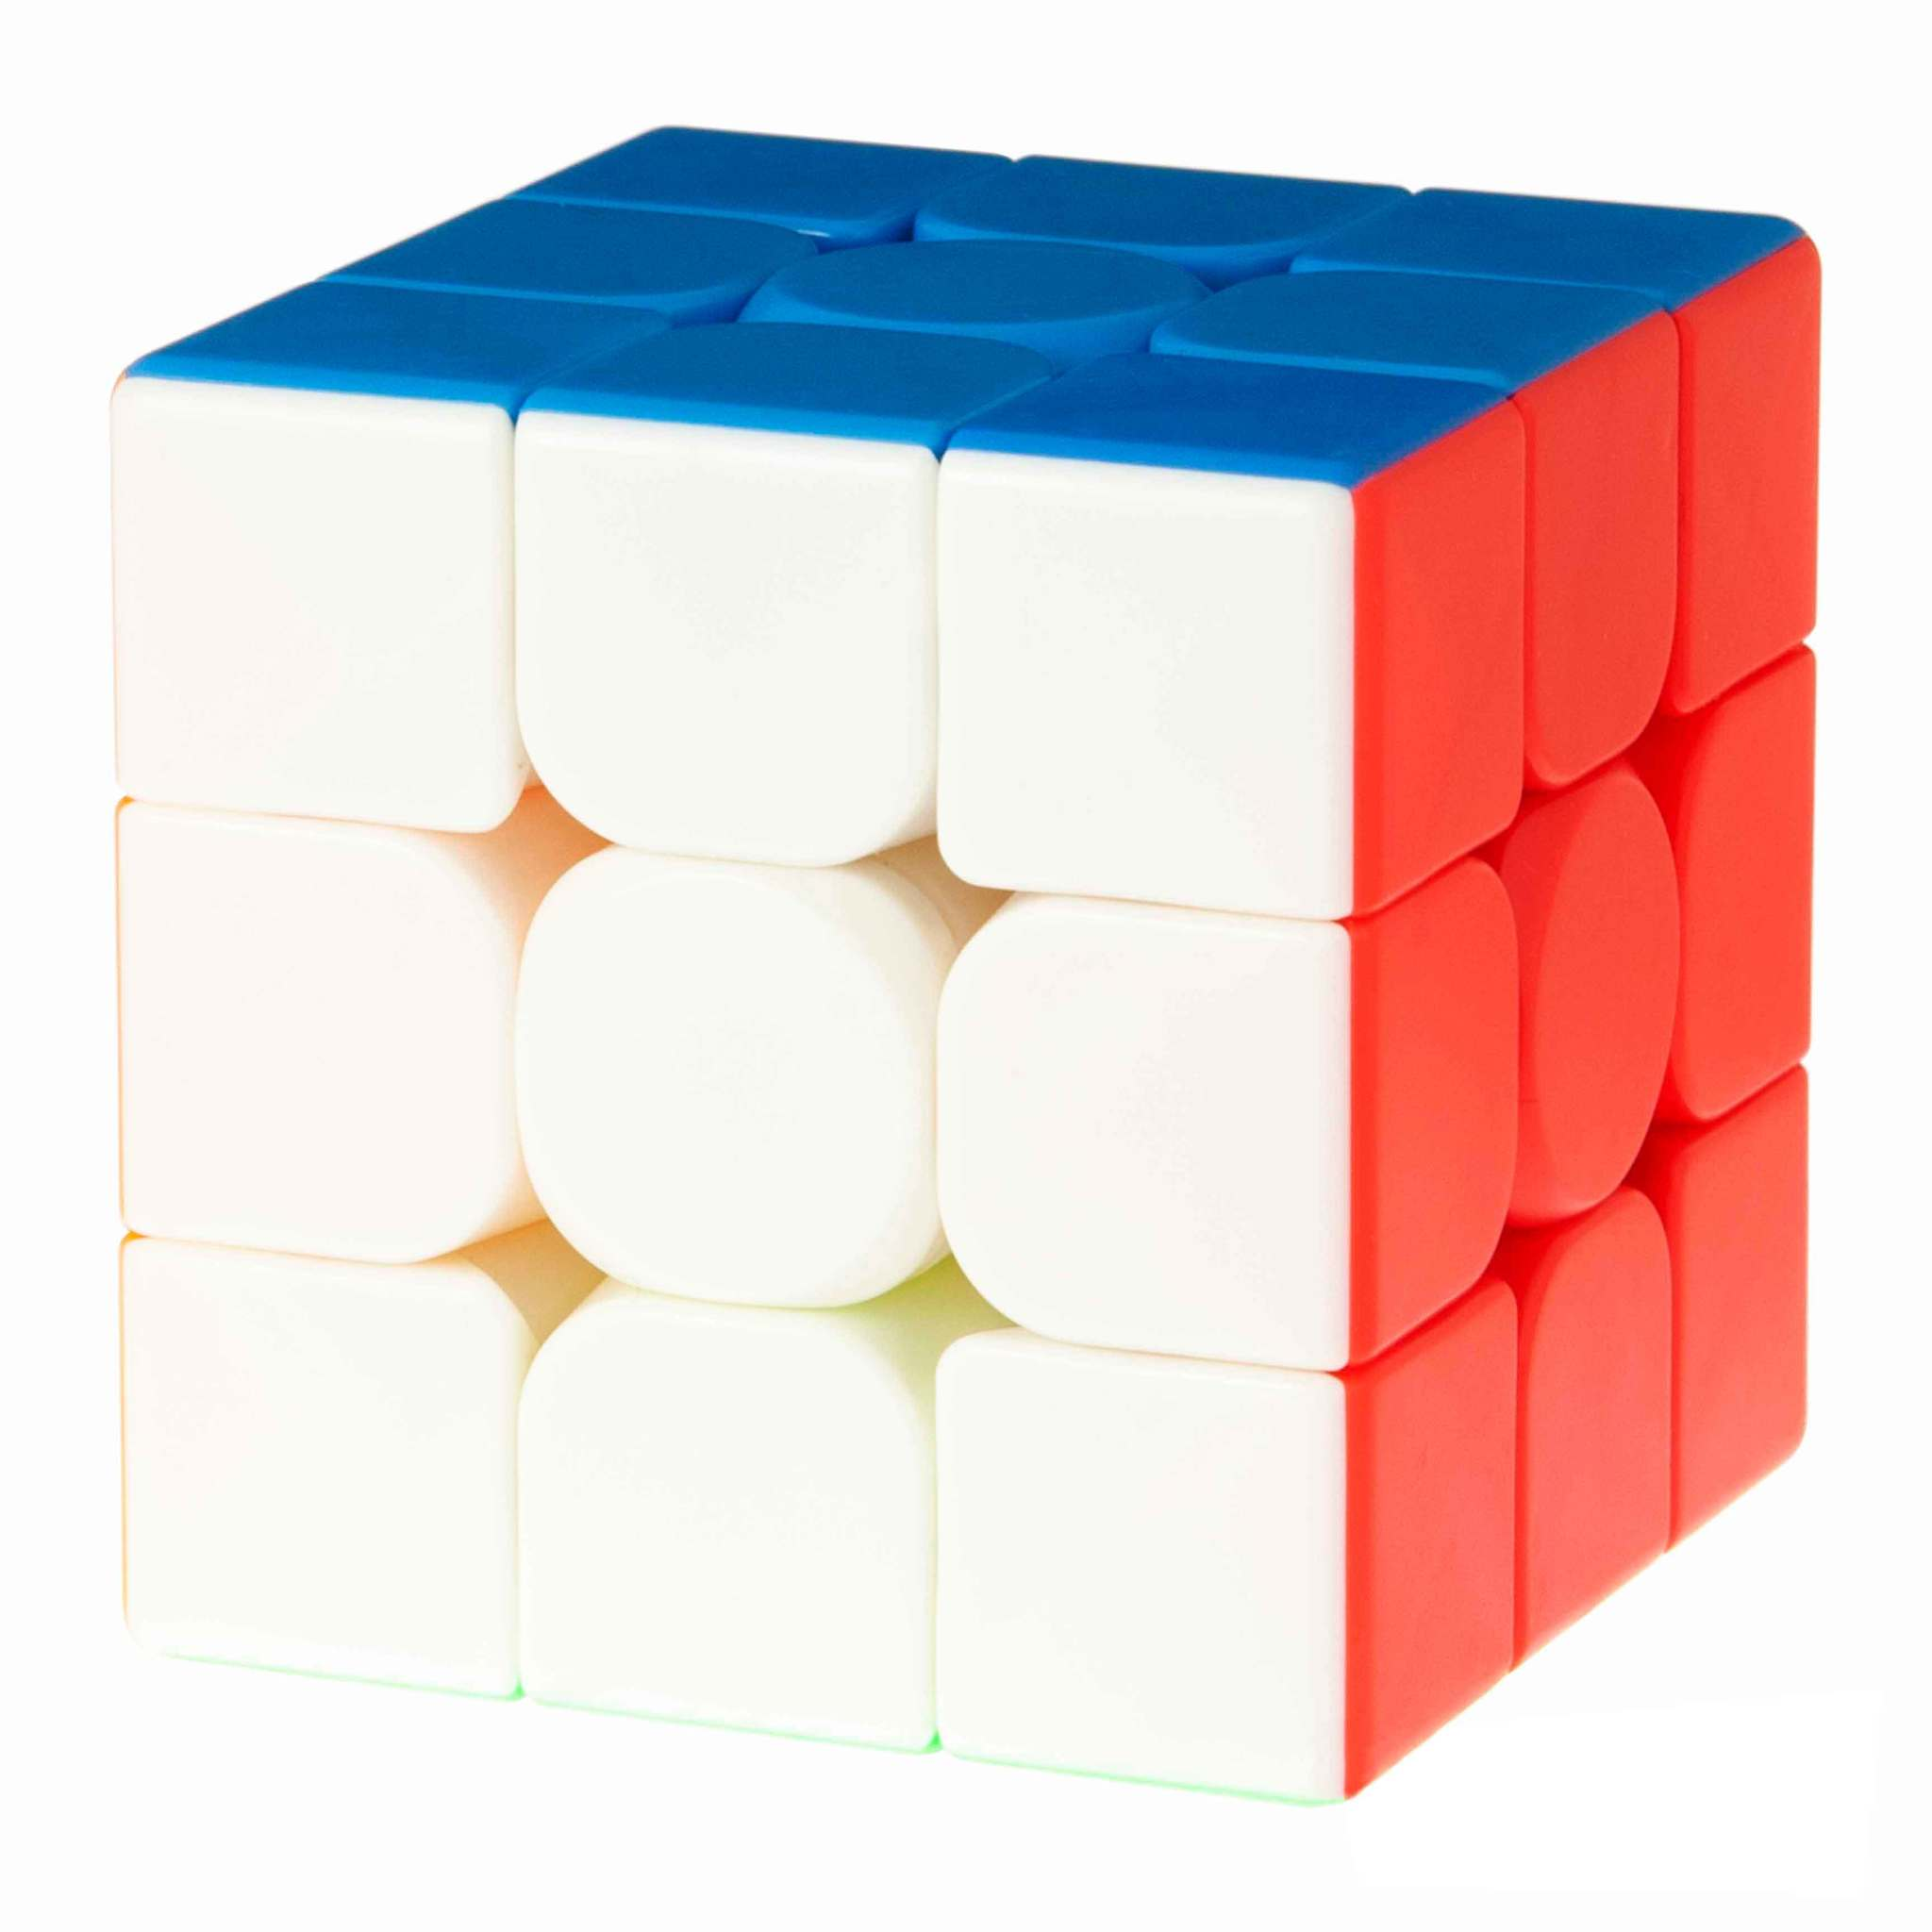 Скоростной кубик 3х3 цветной пластик